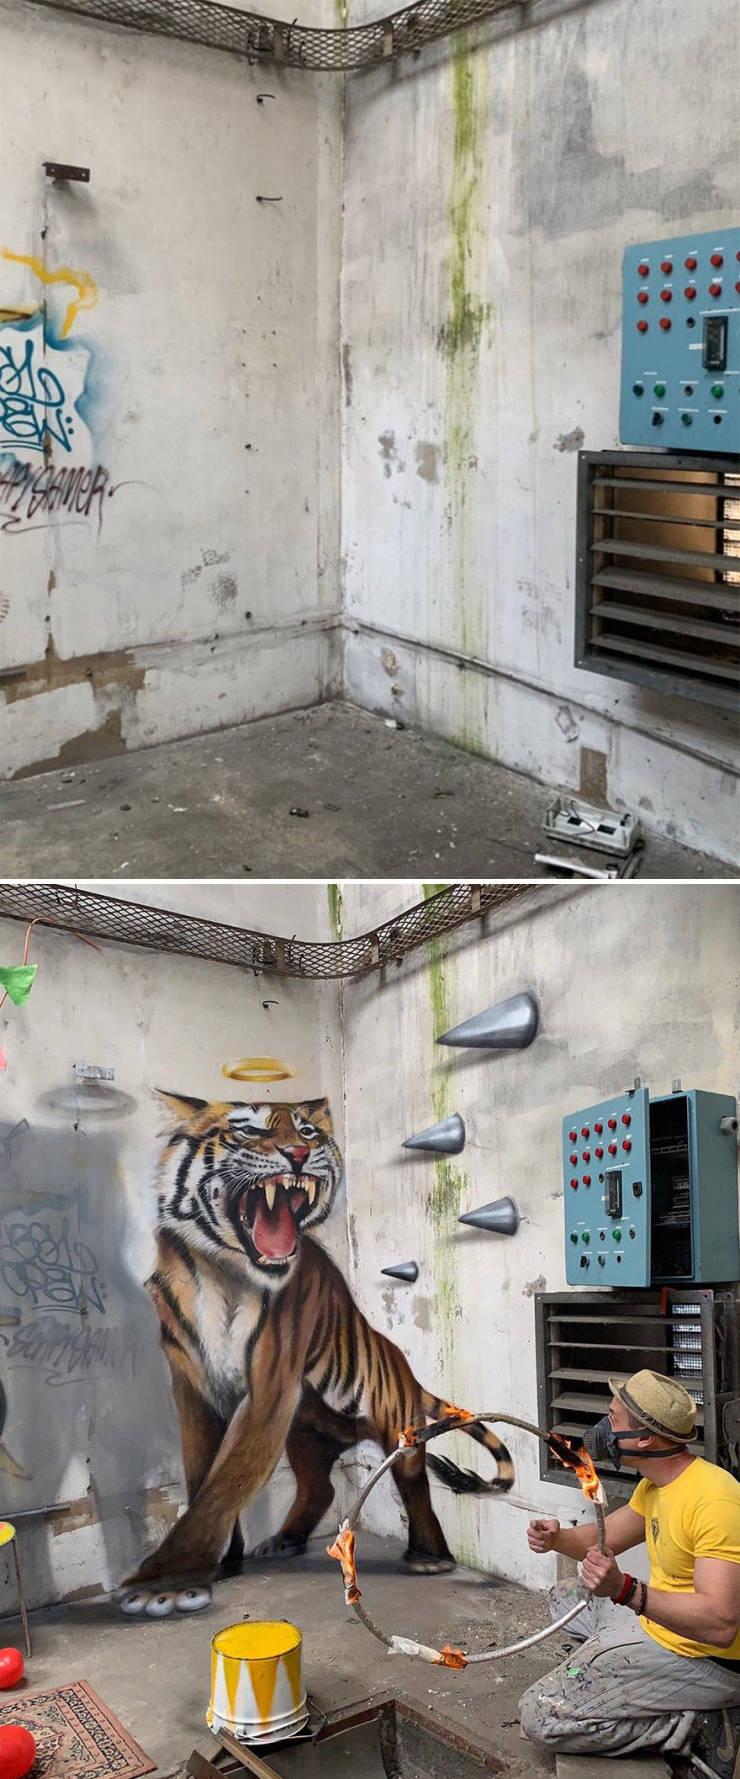 3d street art 6 فن الشارع ثلاثي الابعاد